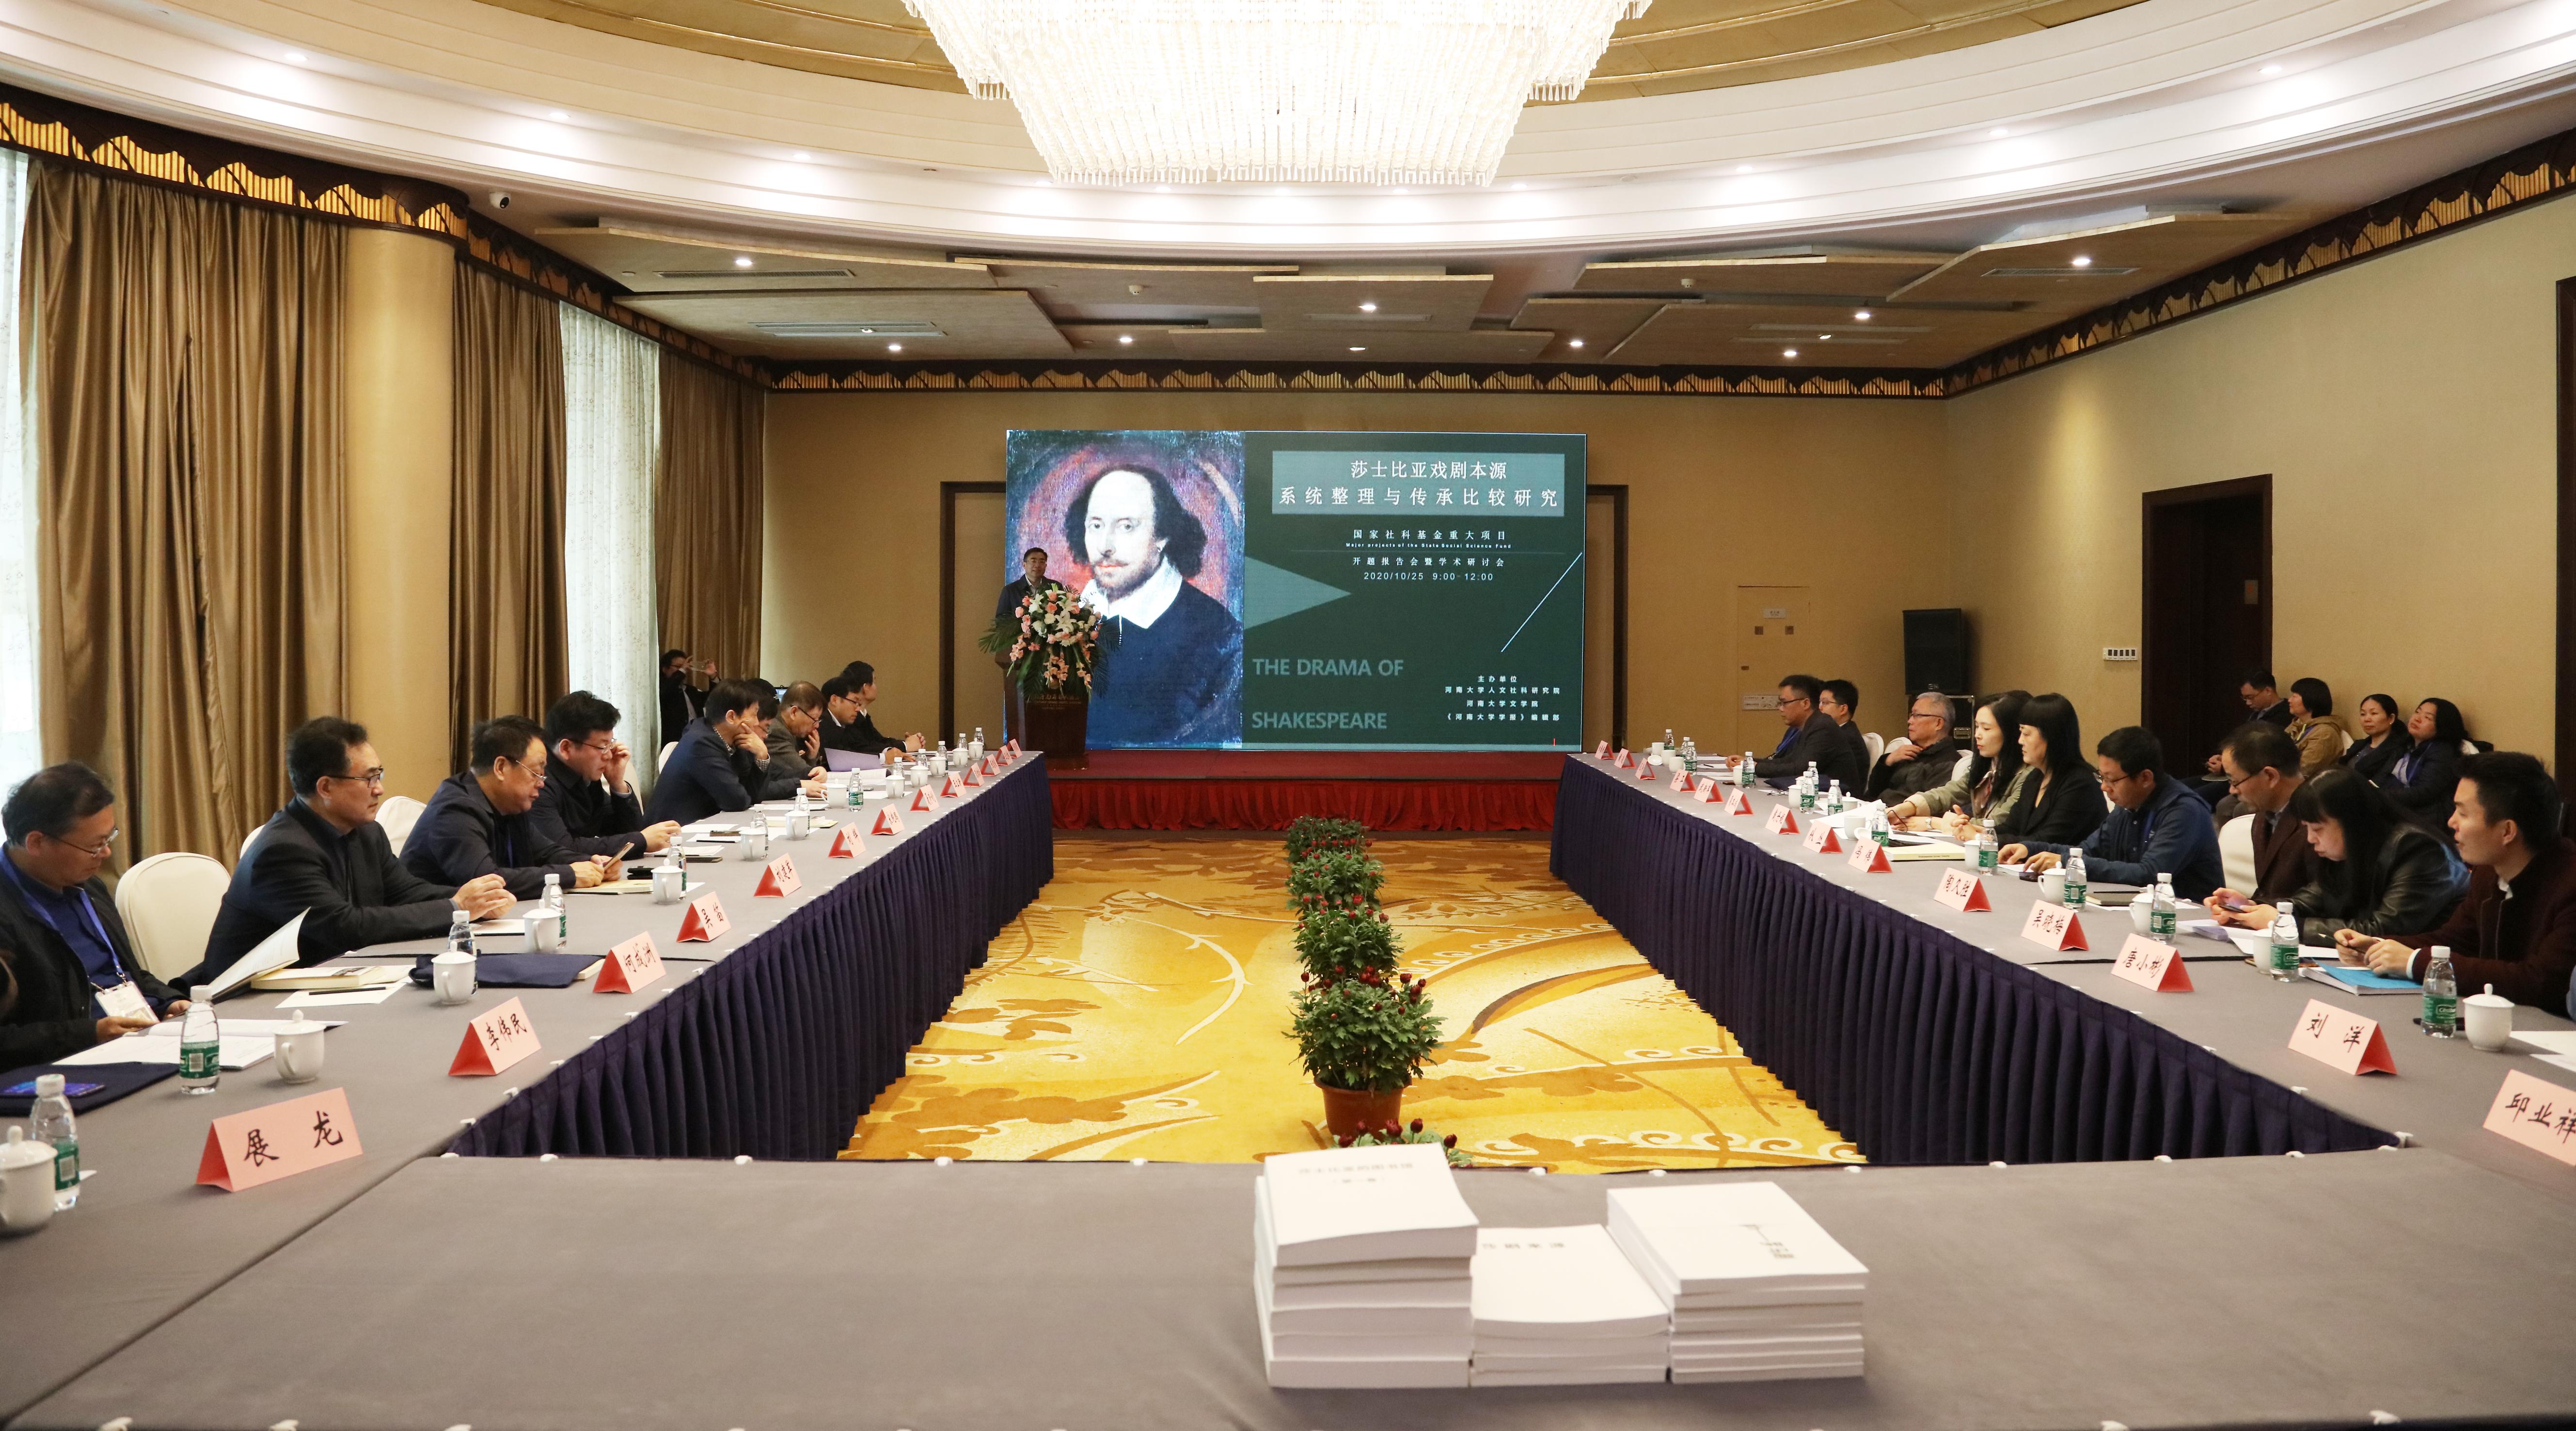 http://www.youxixj.com/quanqiuredian/372346.html